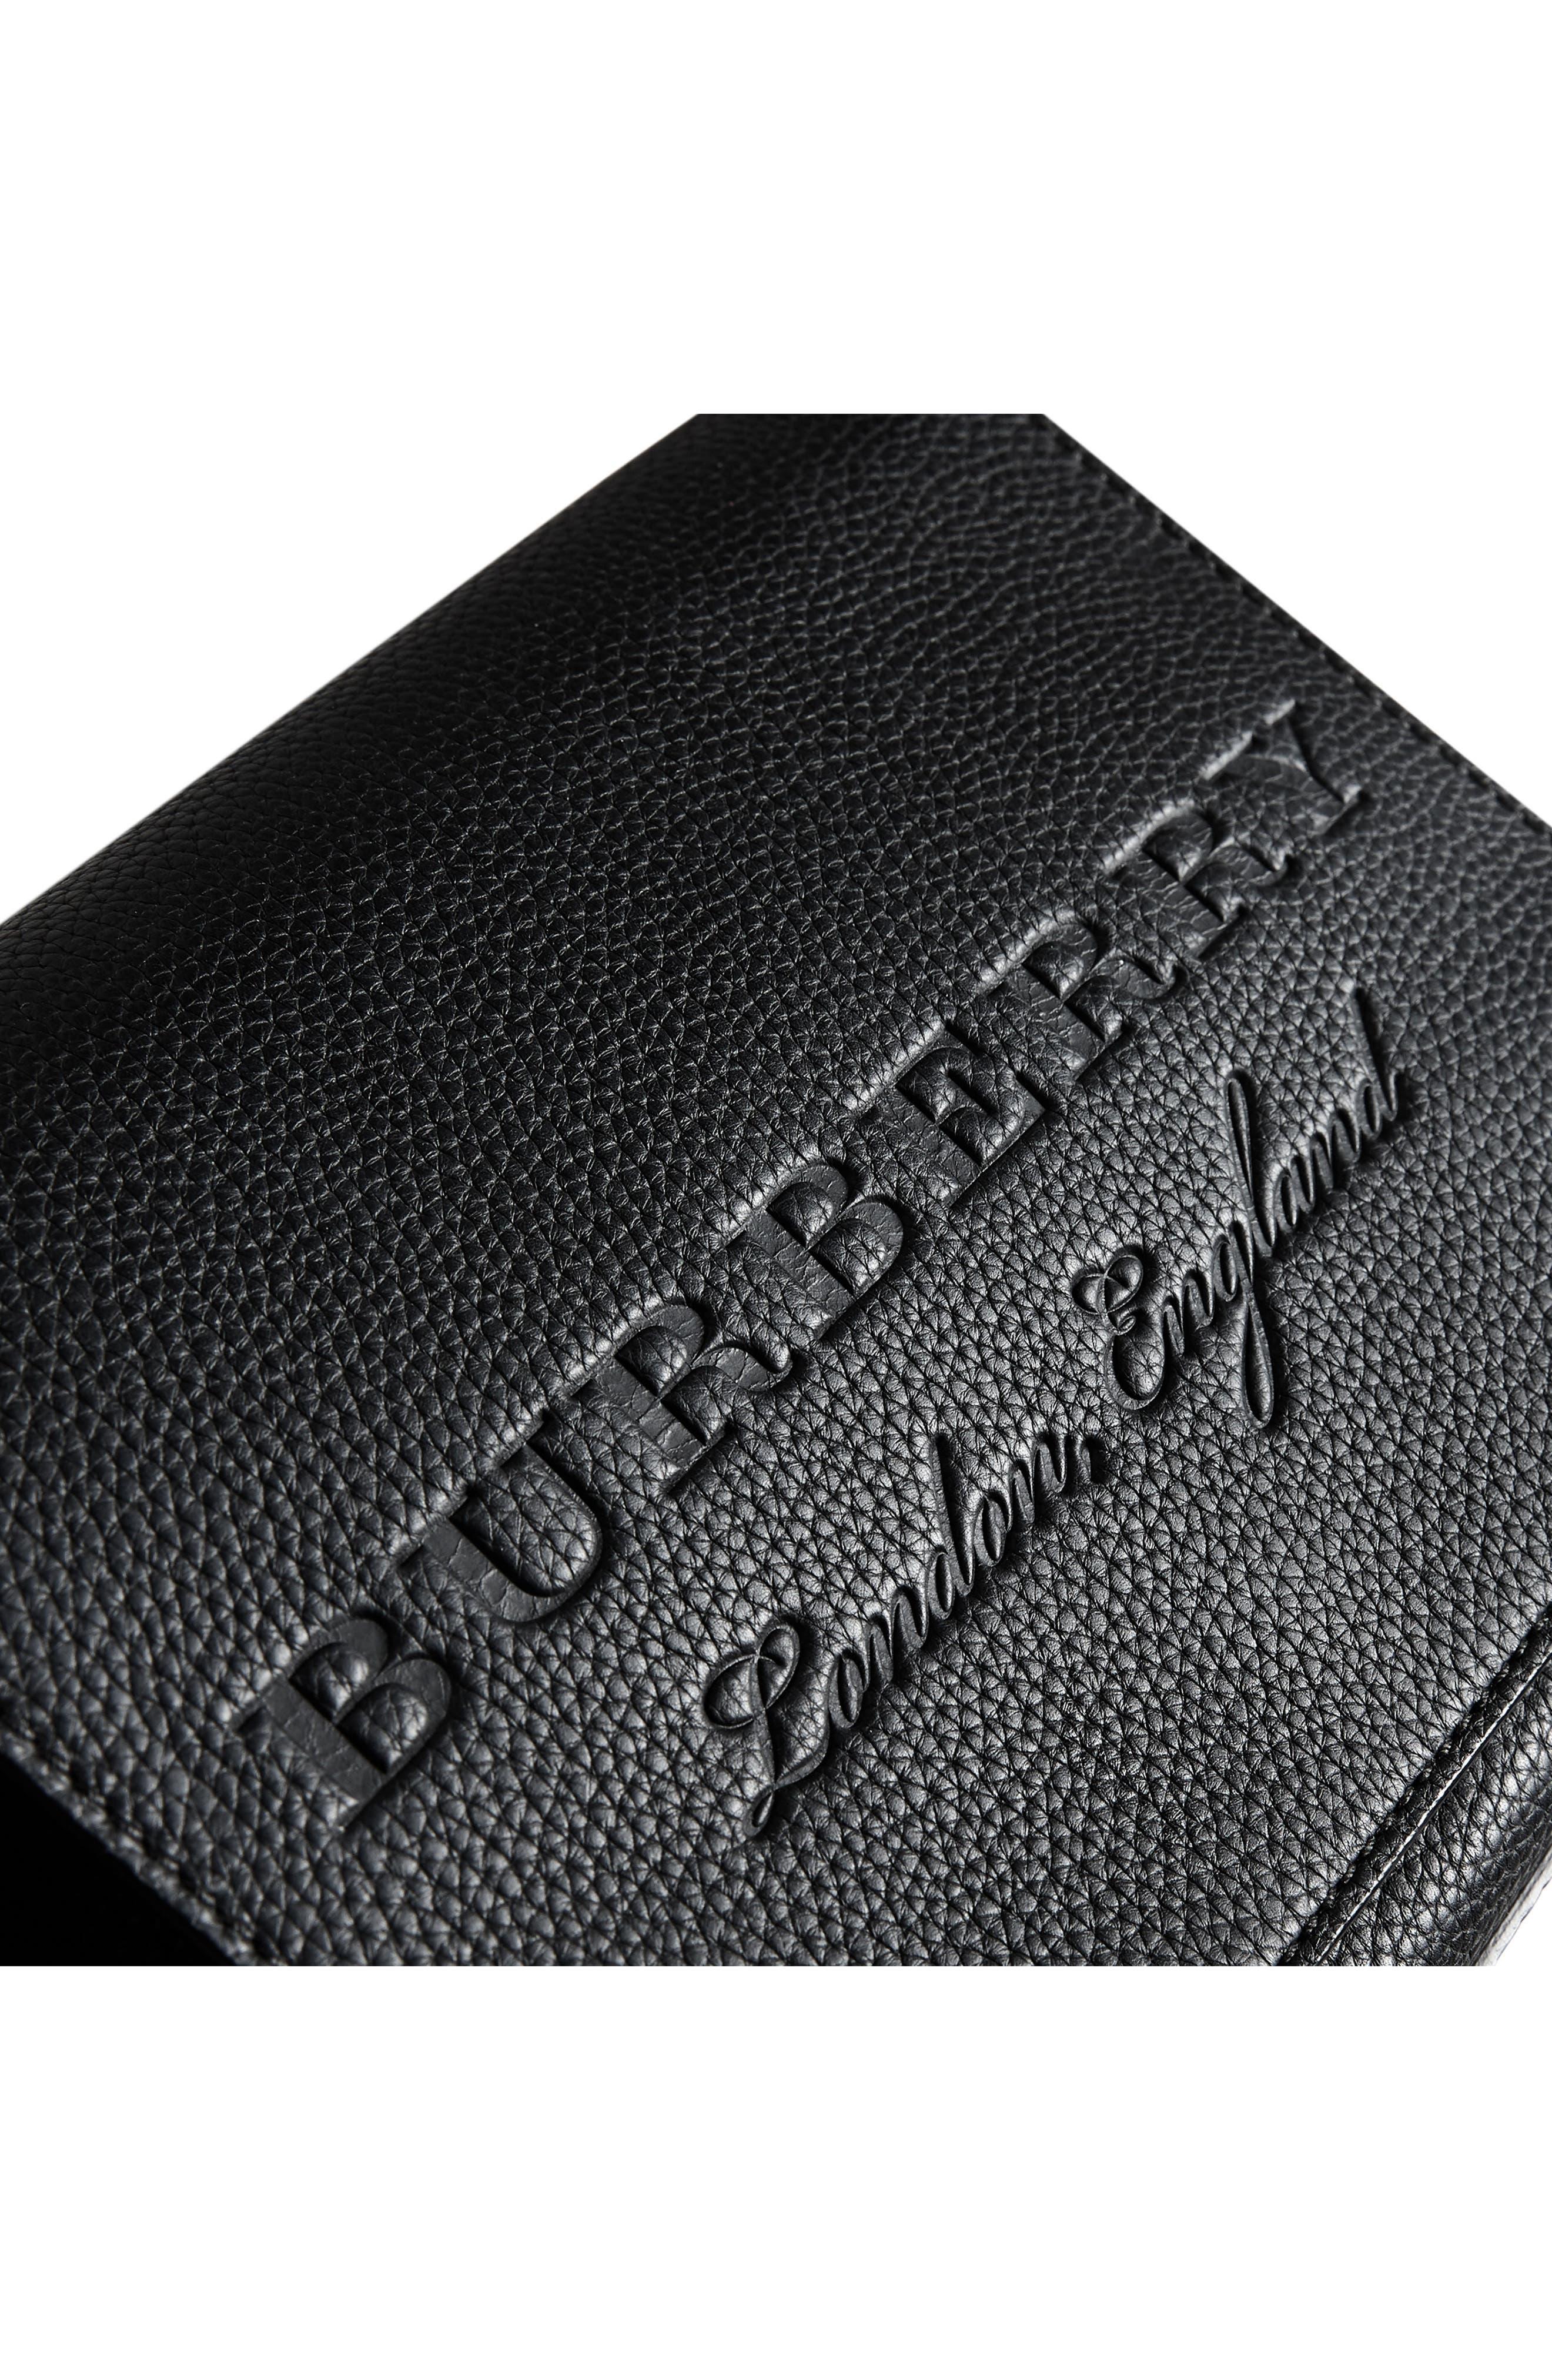 Small Burleigh Leather Crossbody Bag,                             Alternate thumbnail 7, color,                             001